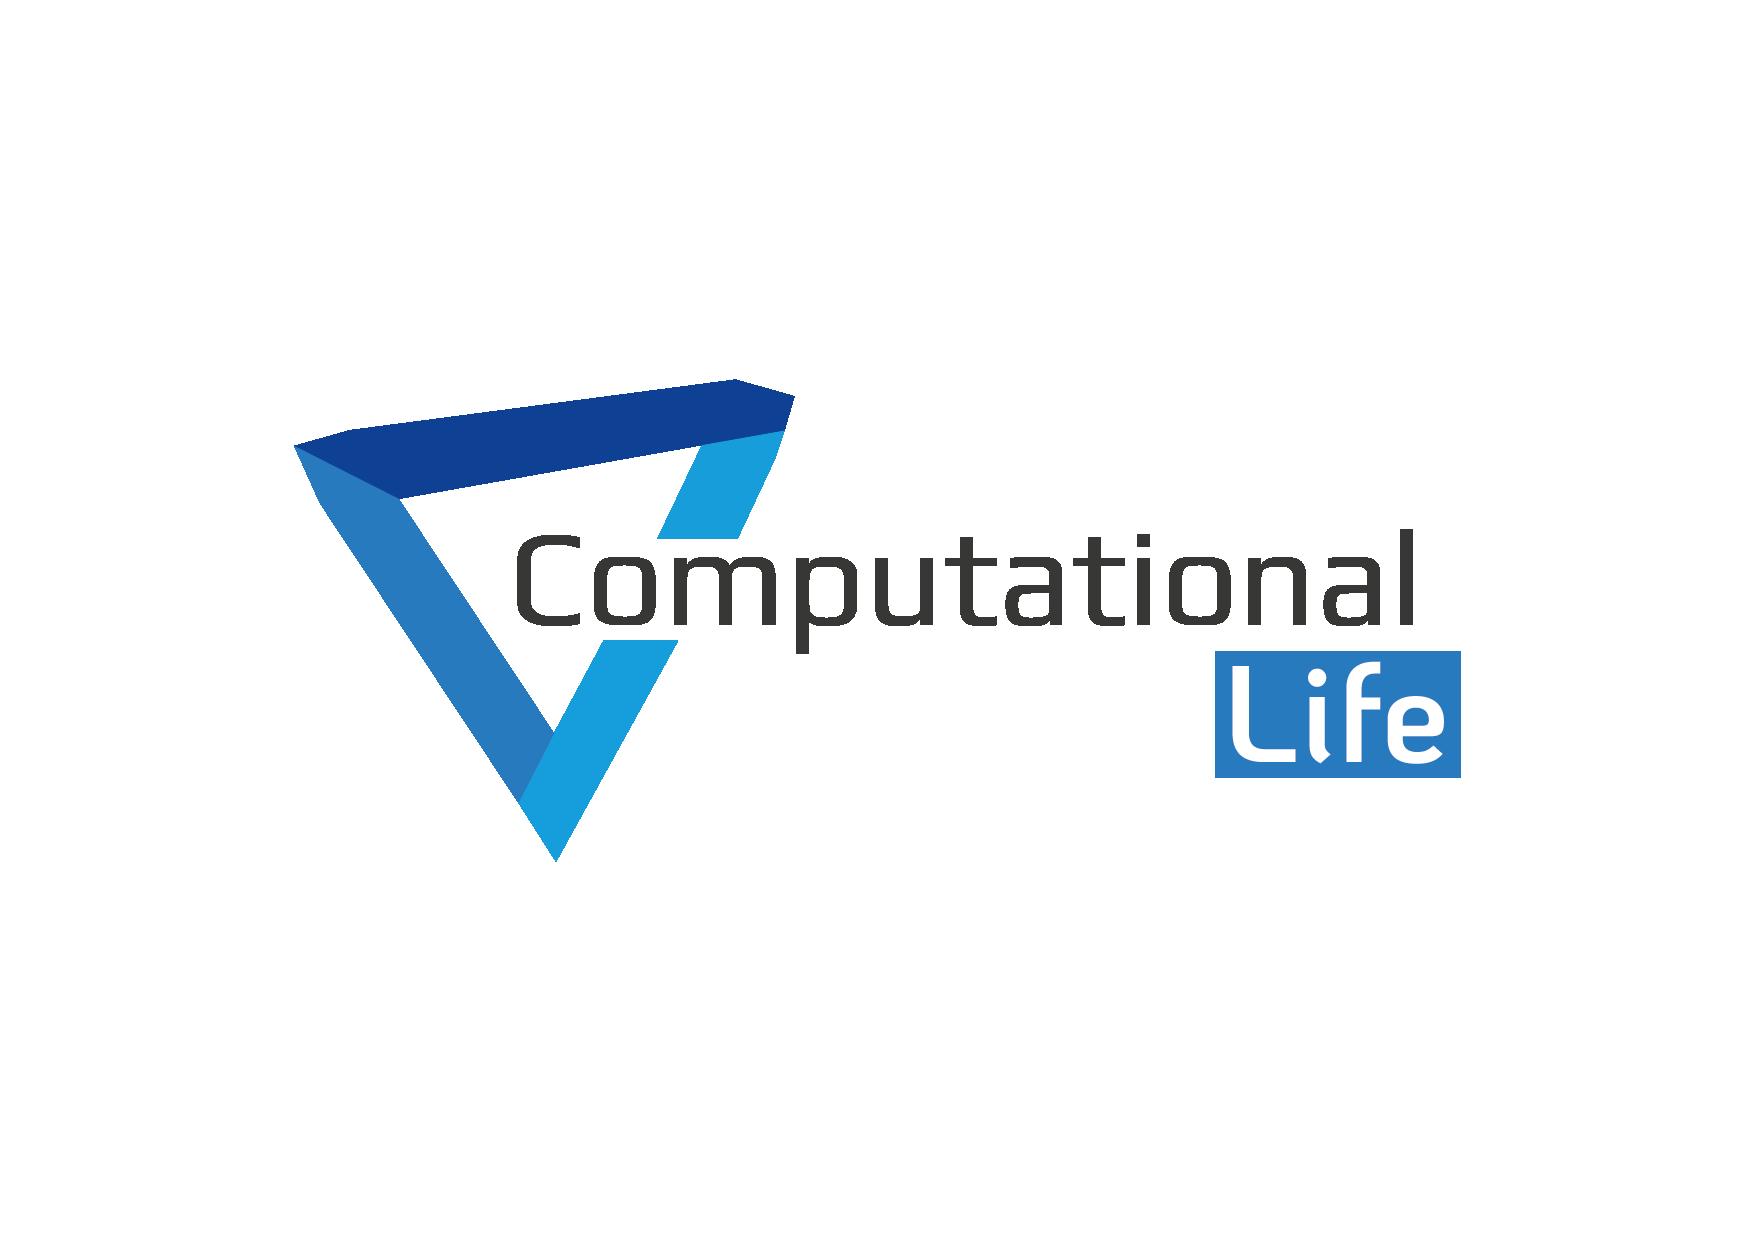 Computational Life Inc.